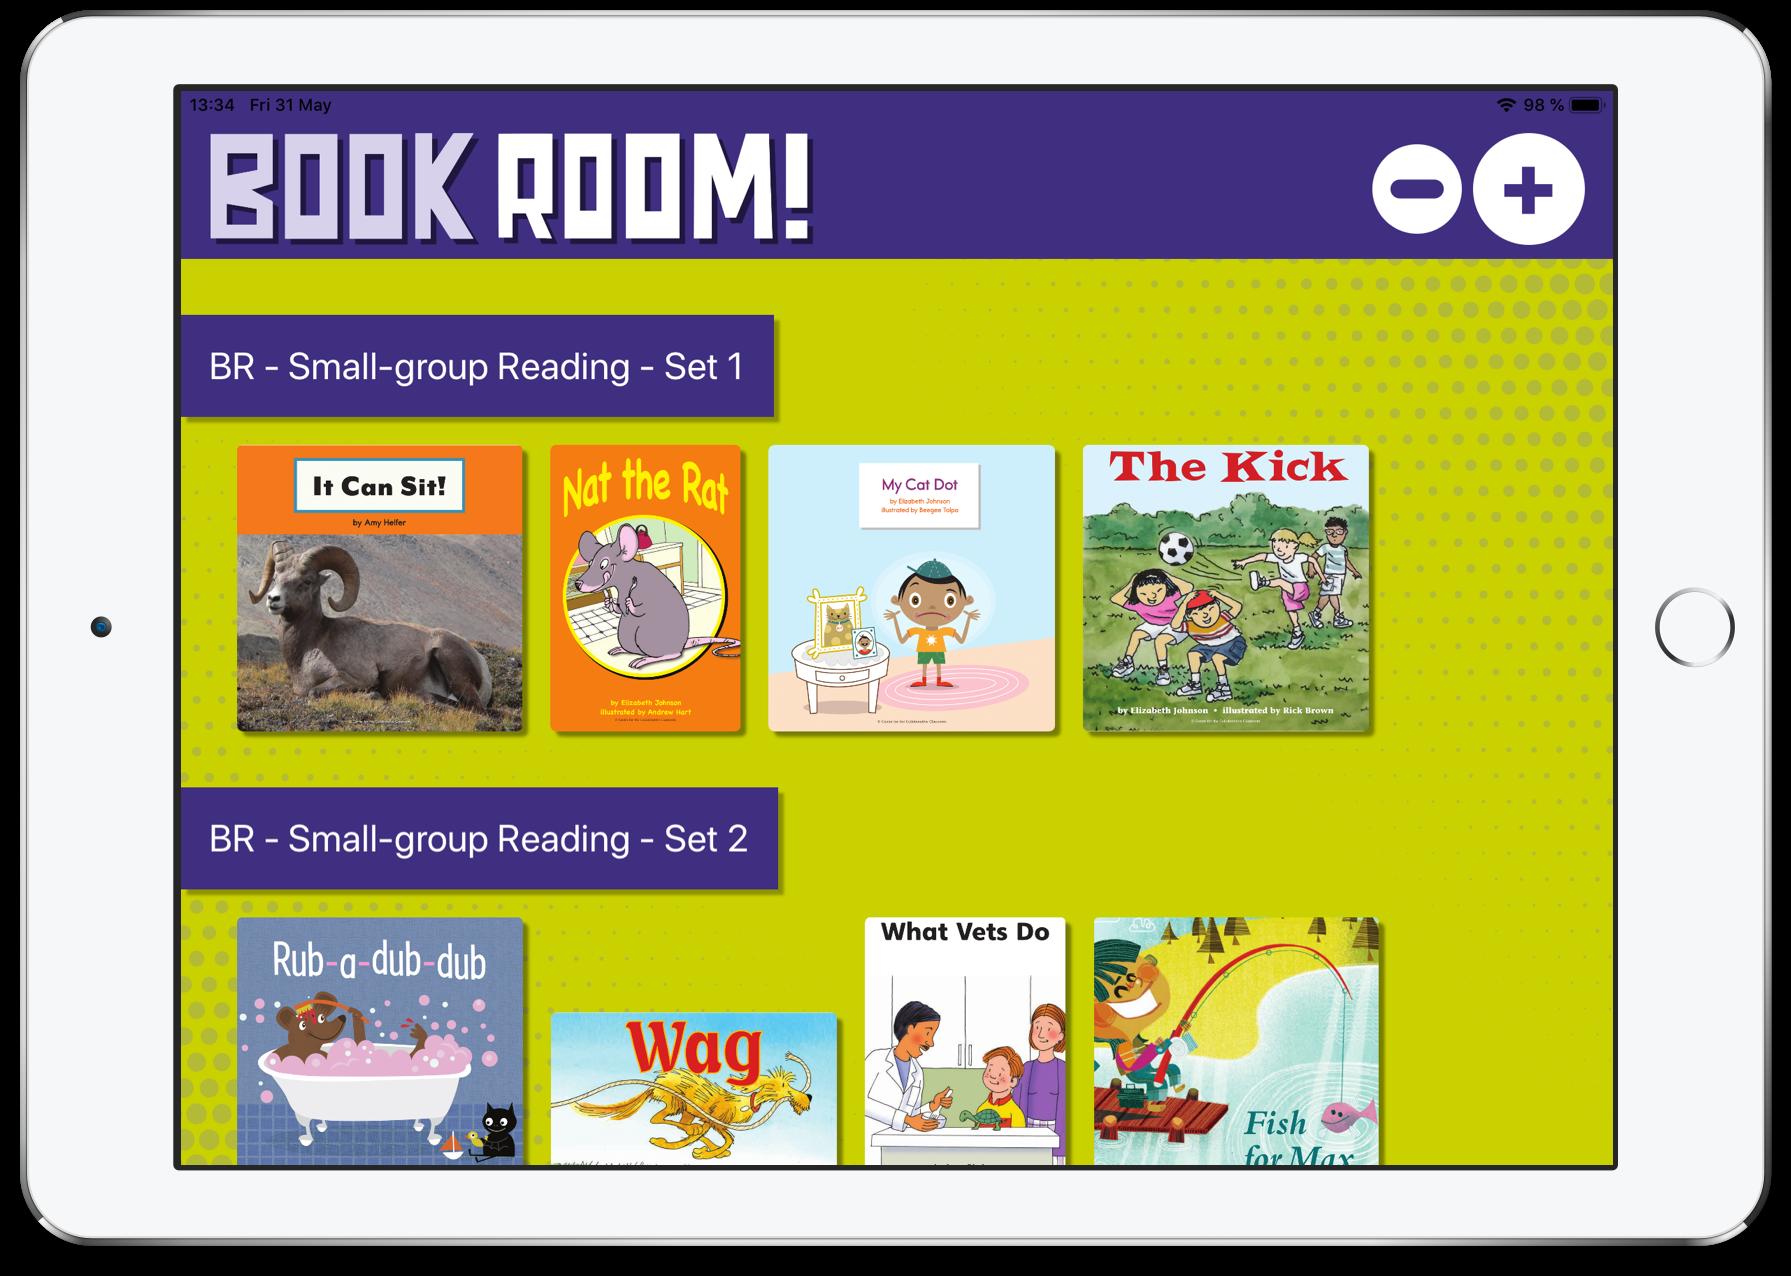 BookRoom iOS app